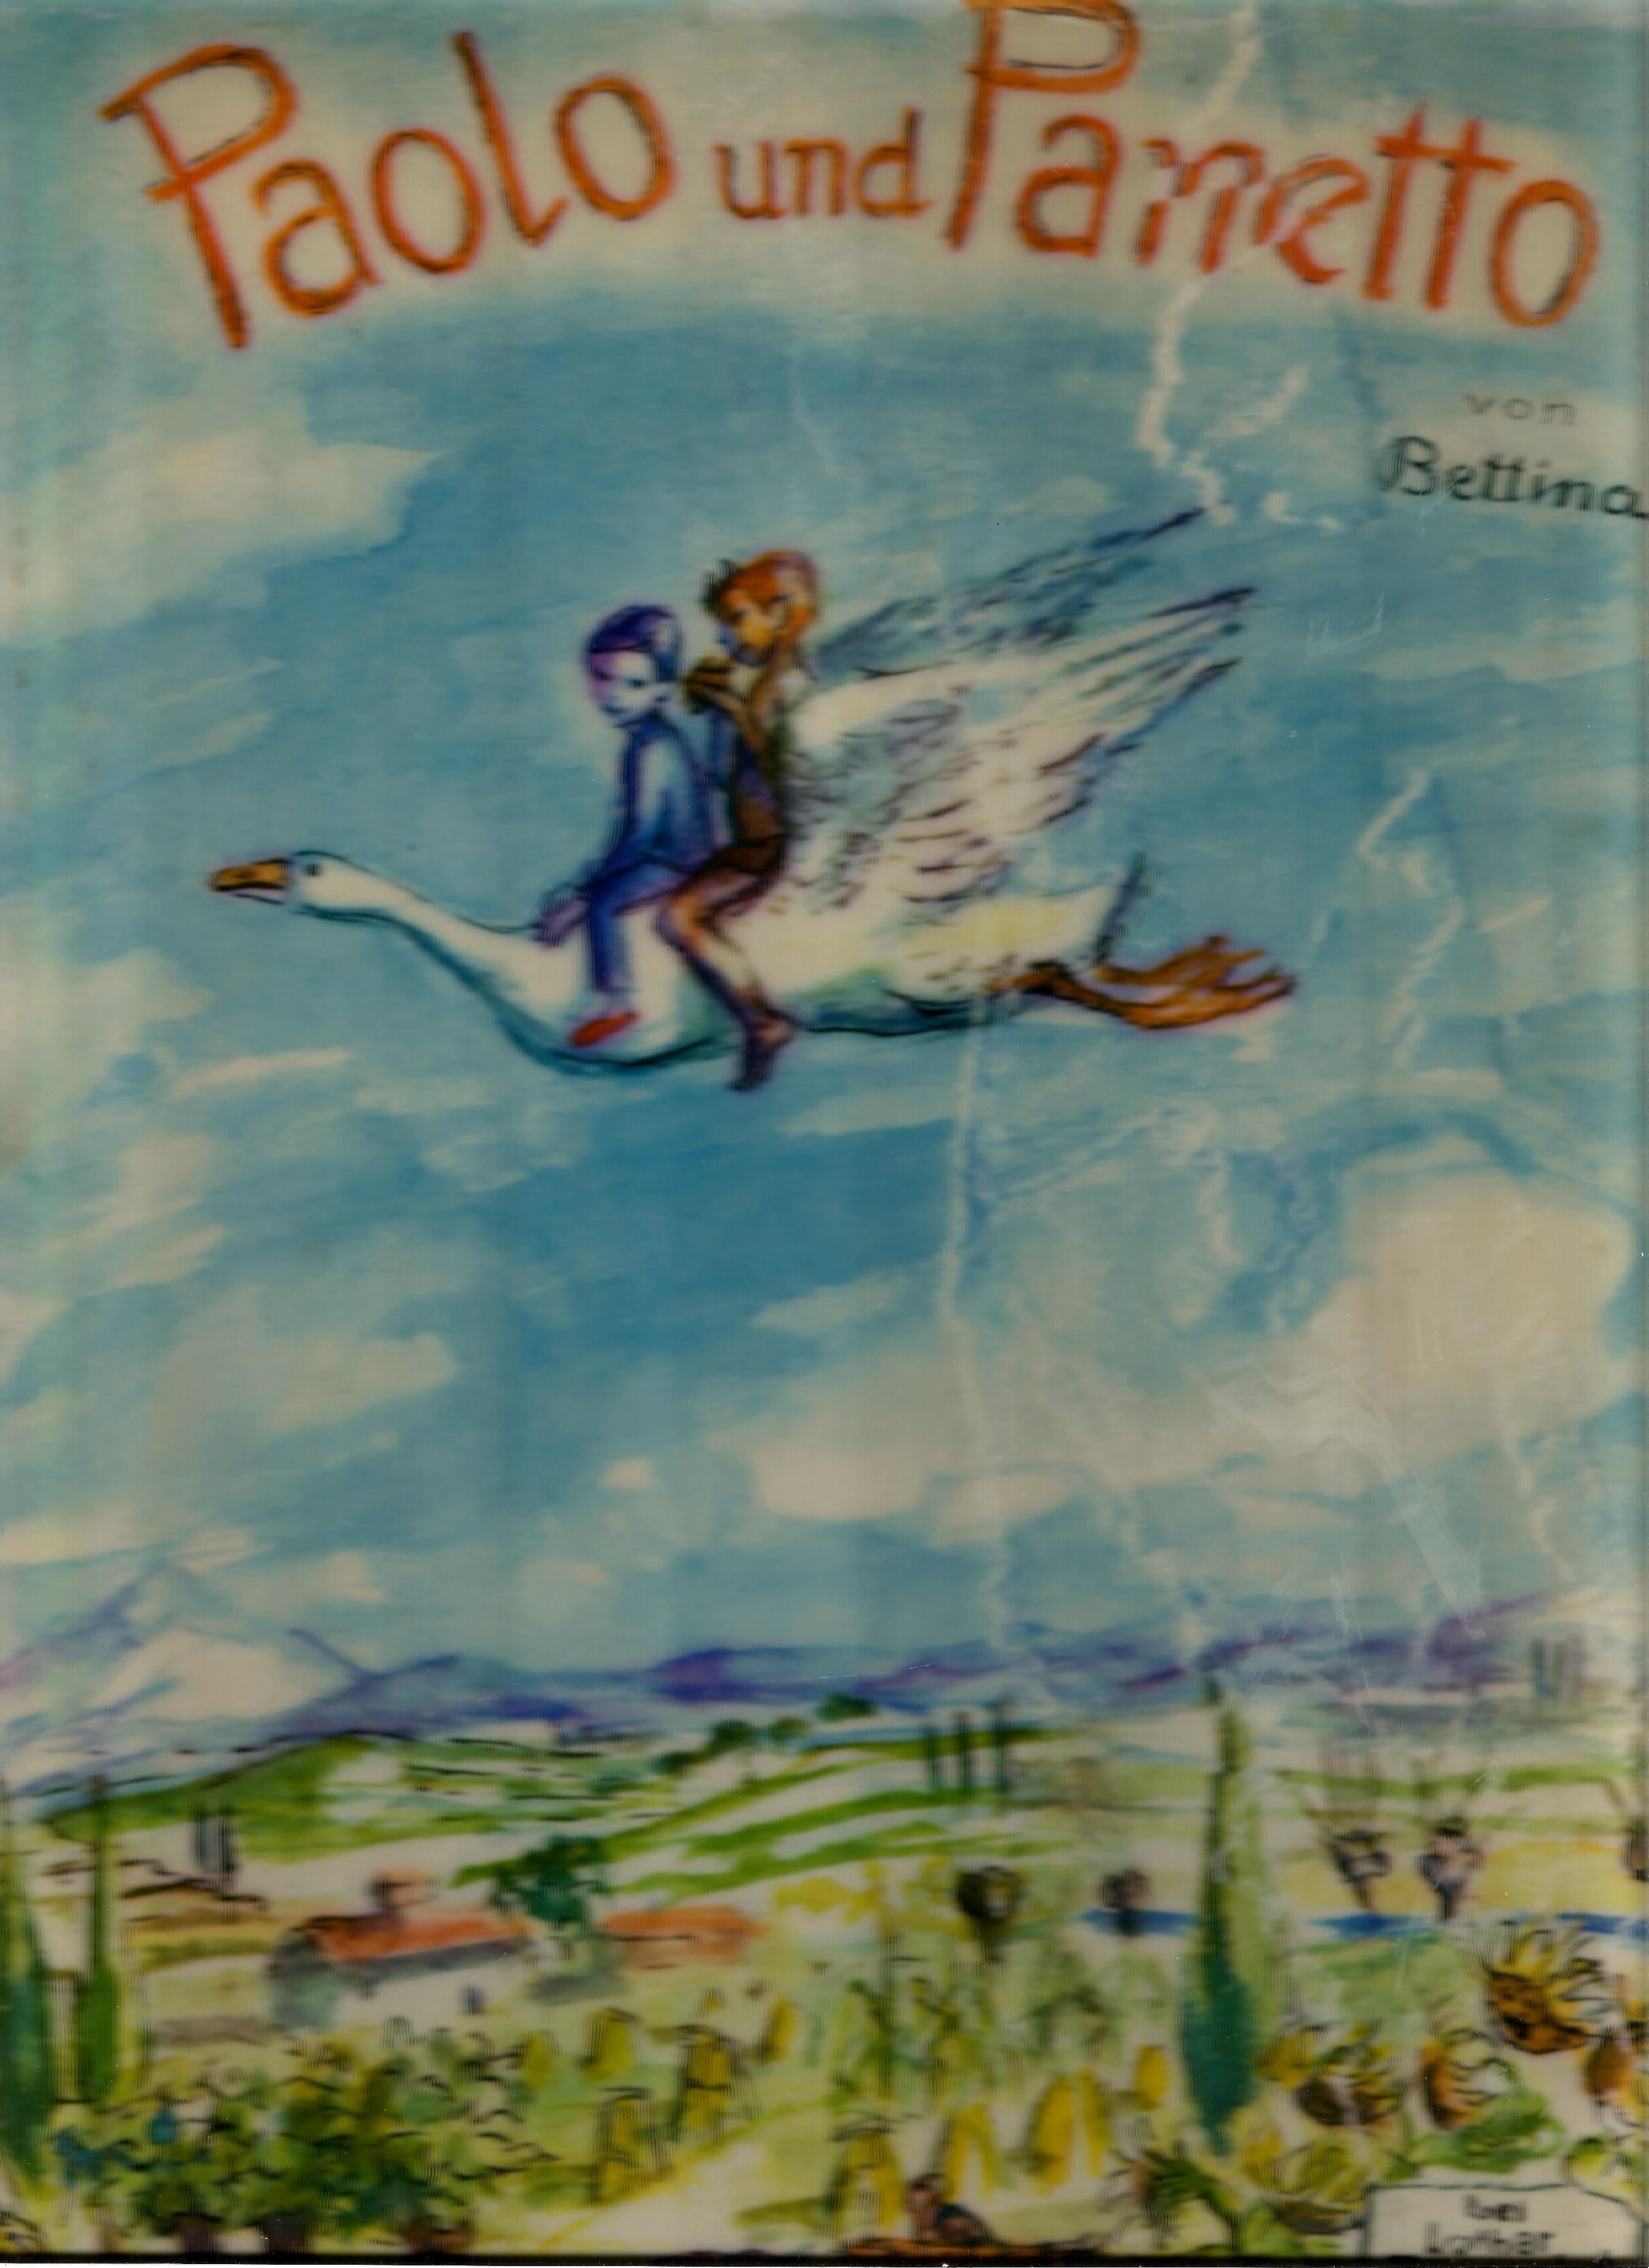 Paolo und Panetto.: Ehrlicher), Bettina: